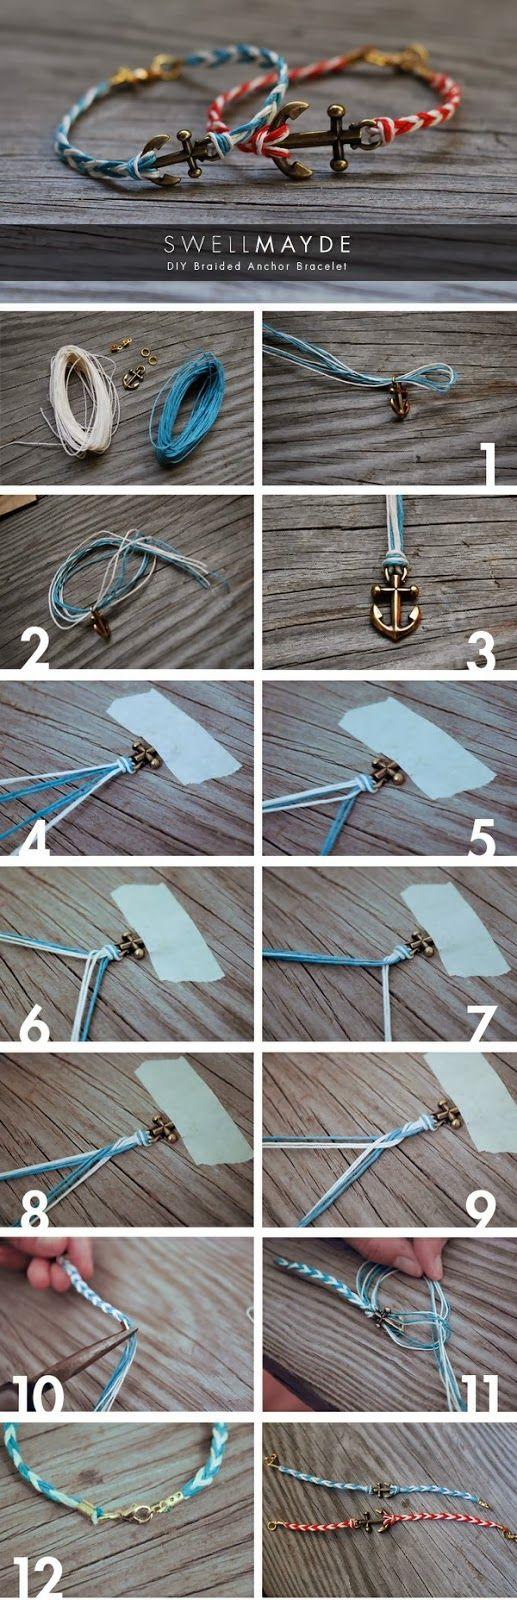 diy bracelet - more inspiration and free tutorials on the blog ...